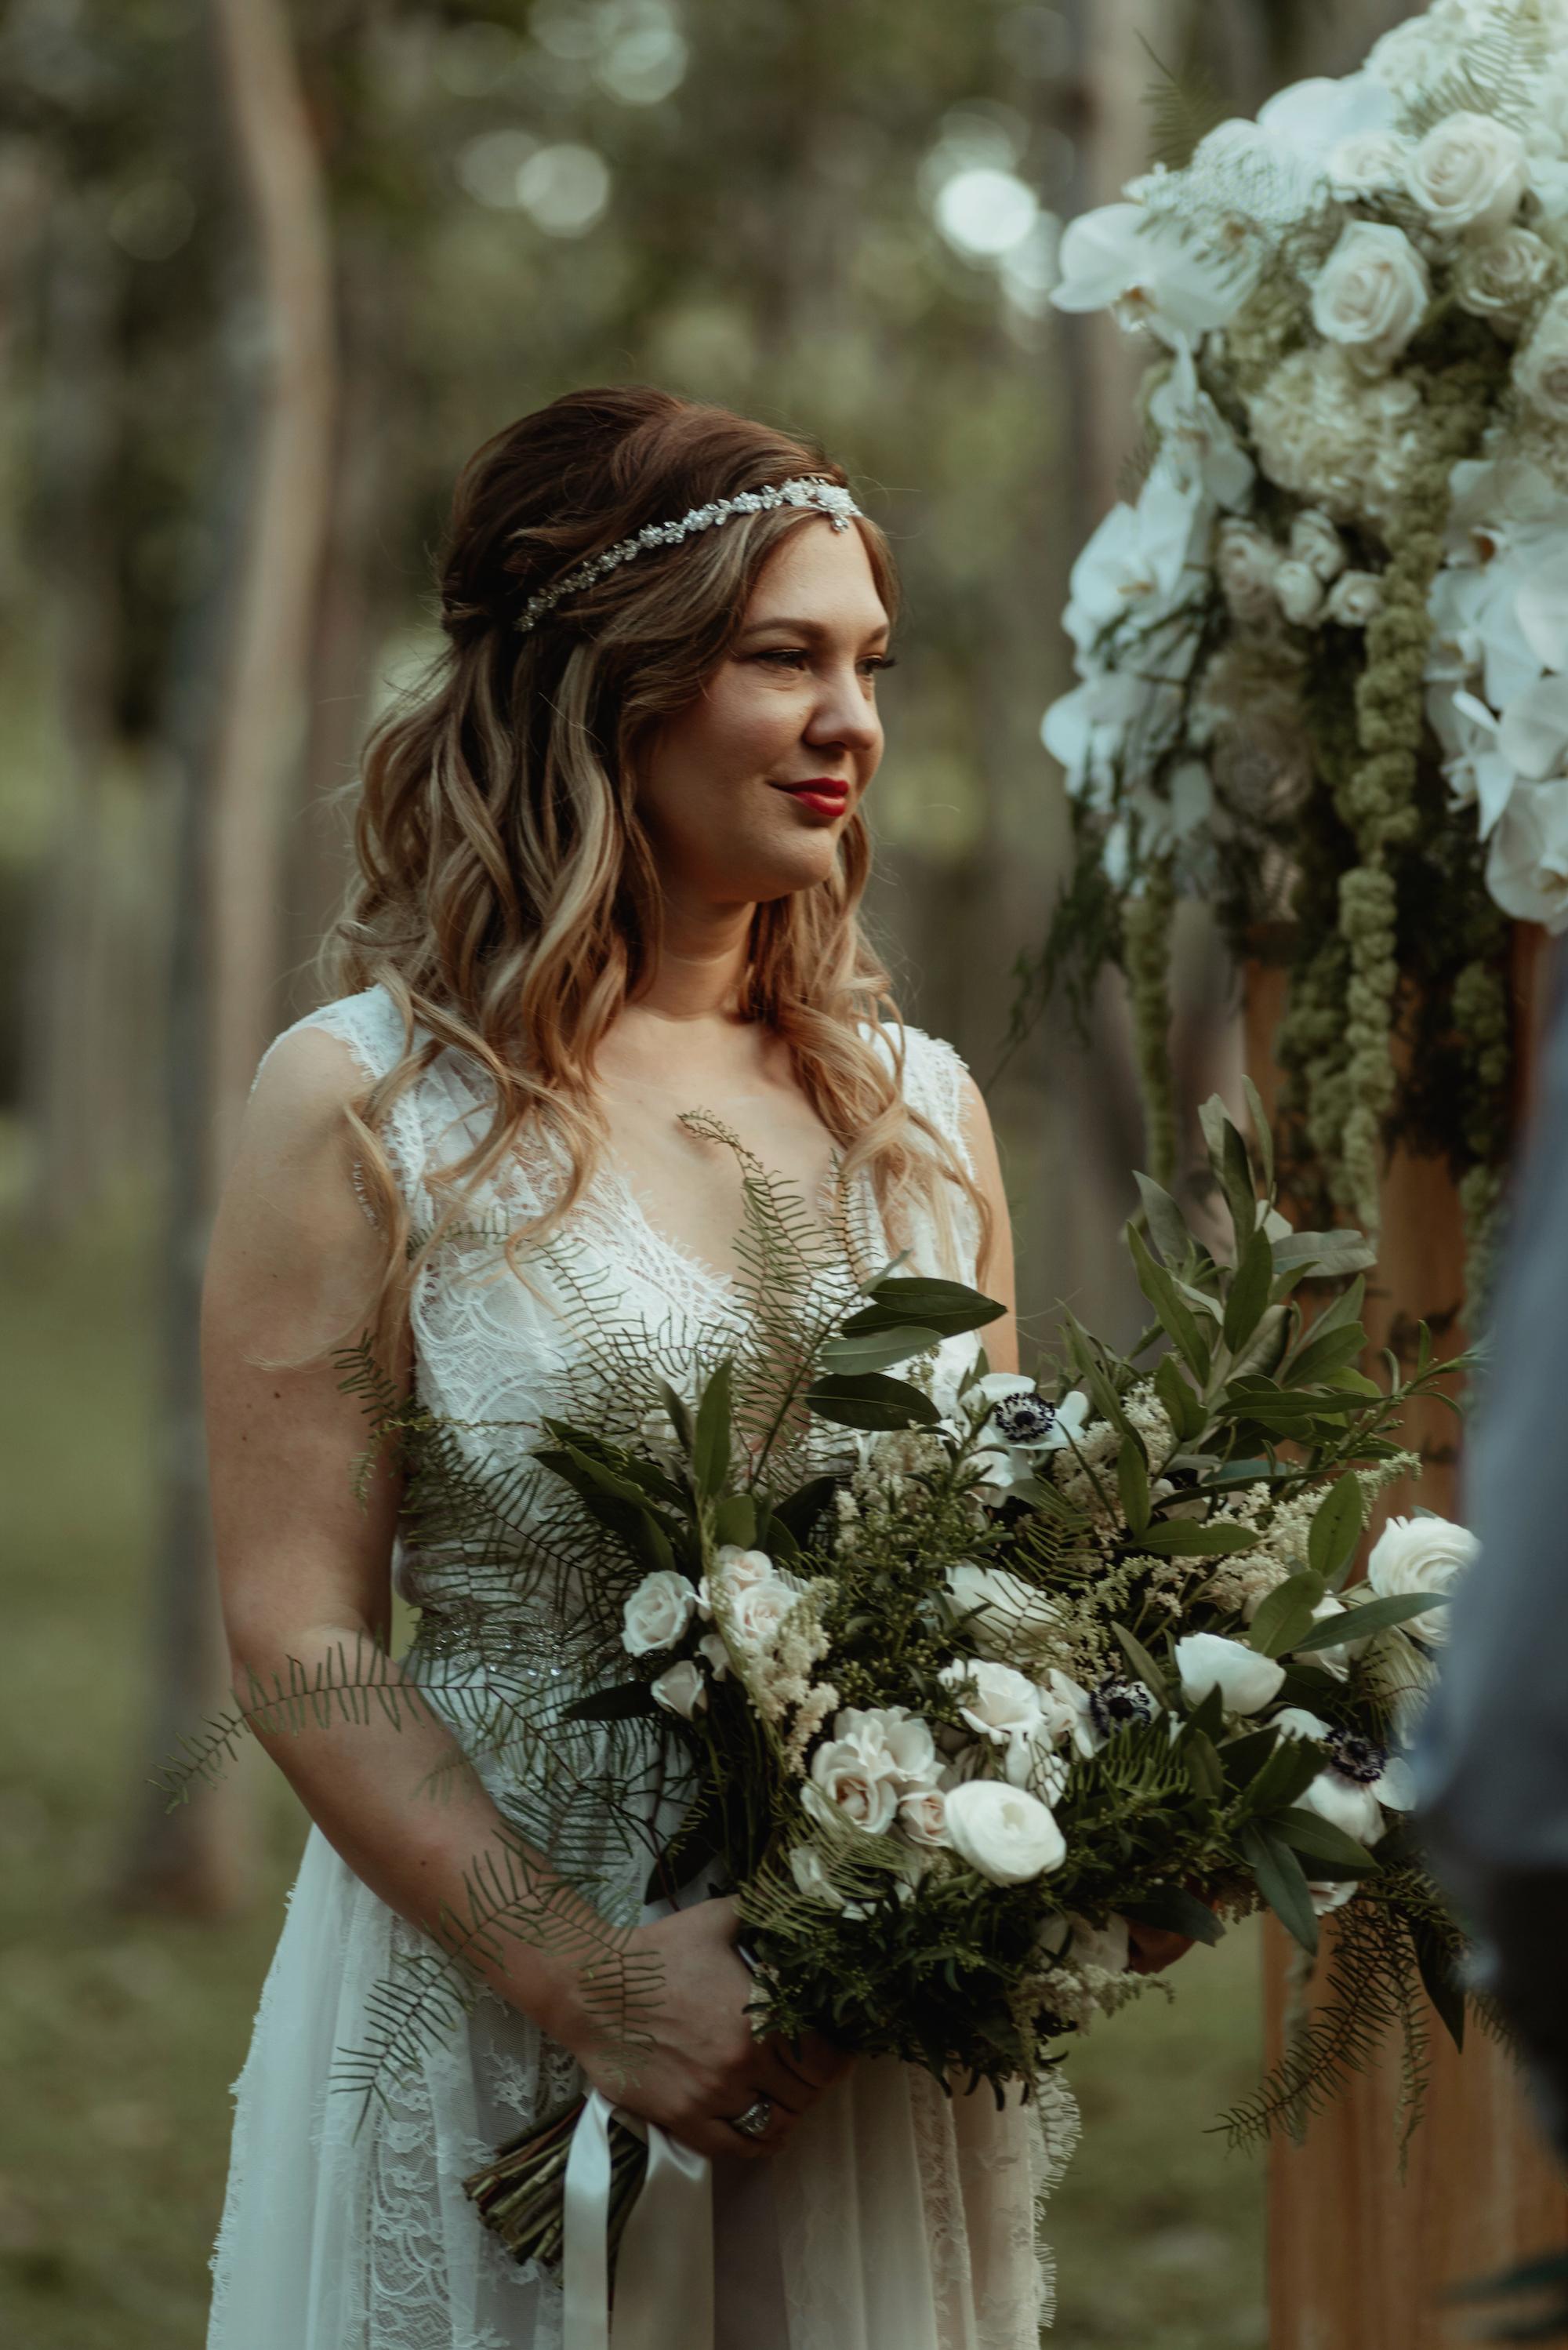 A Beautiful Boho Bride